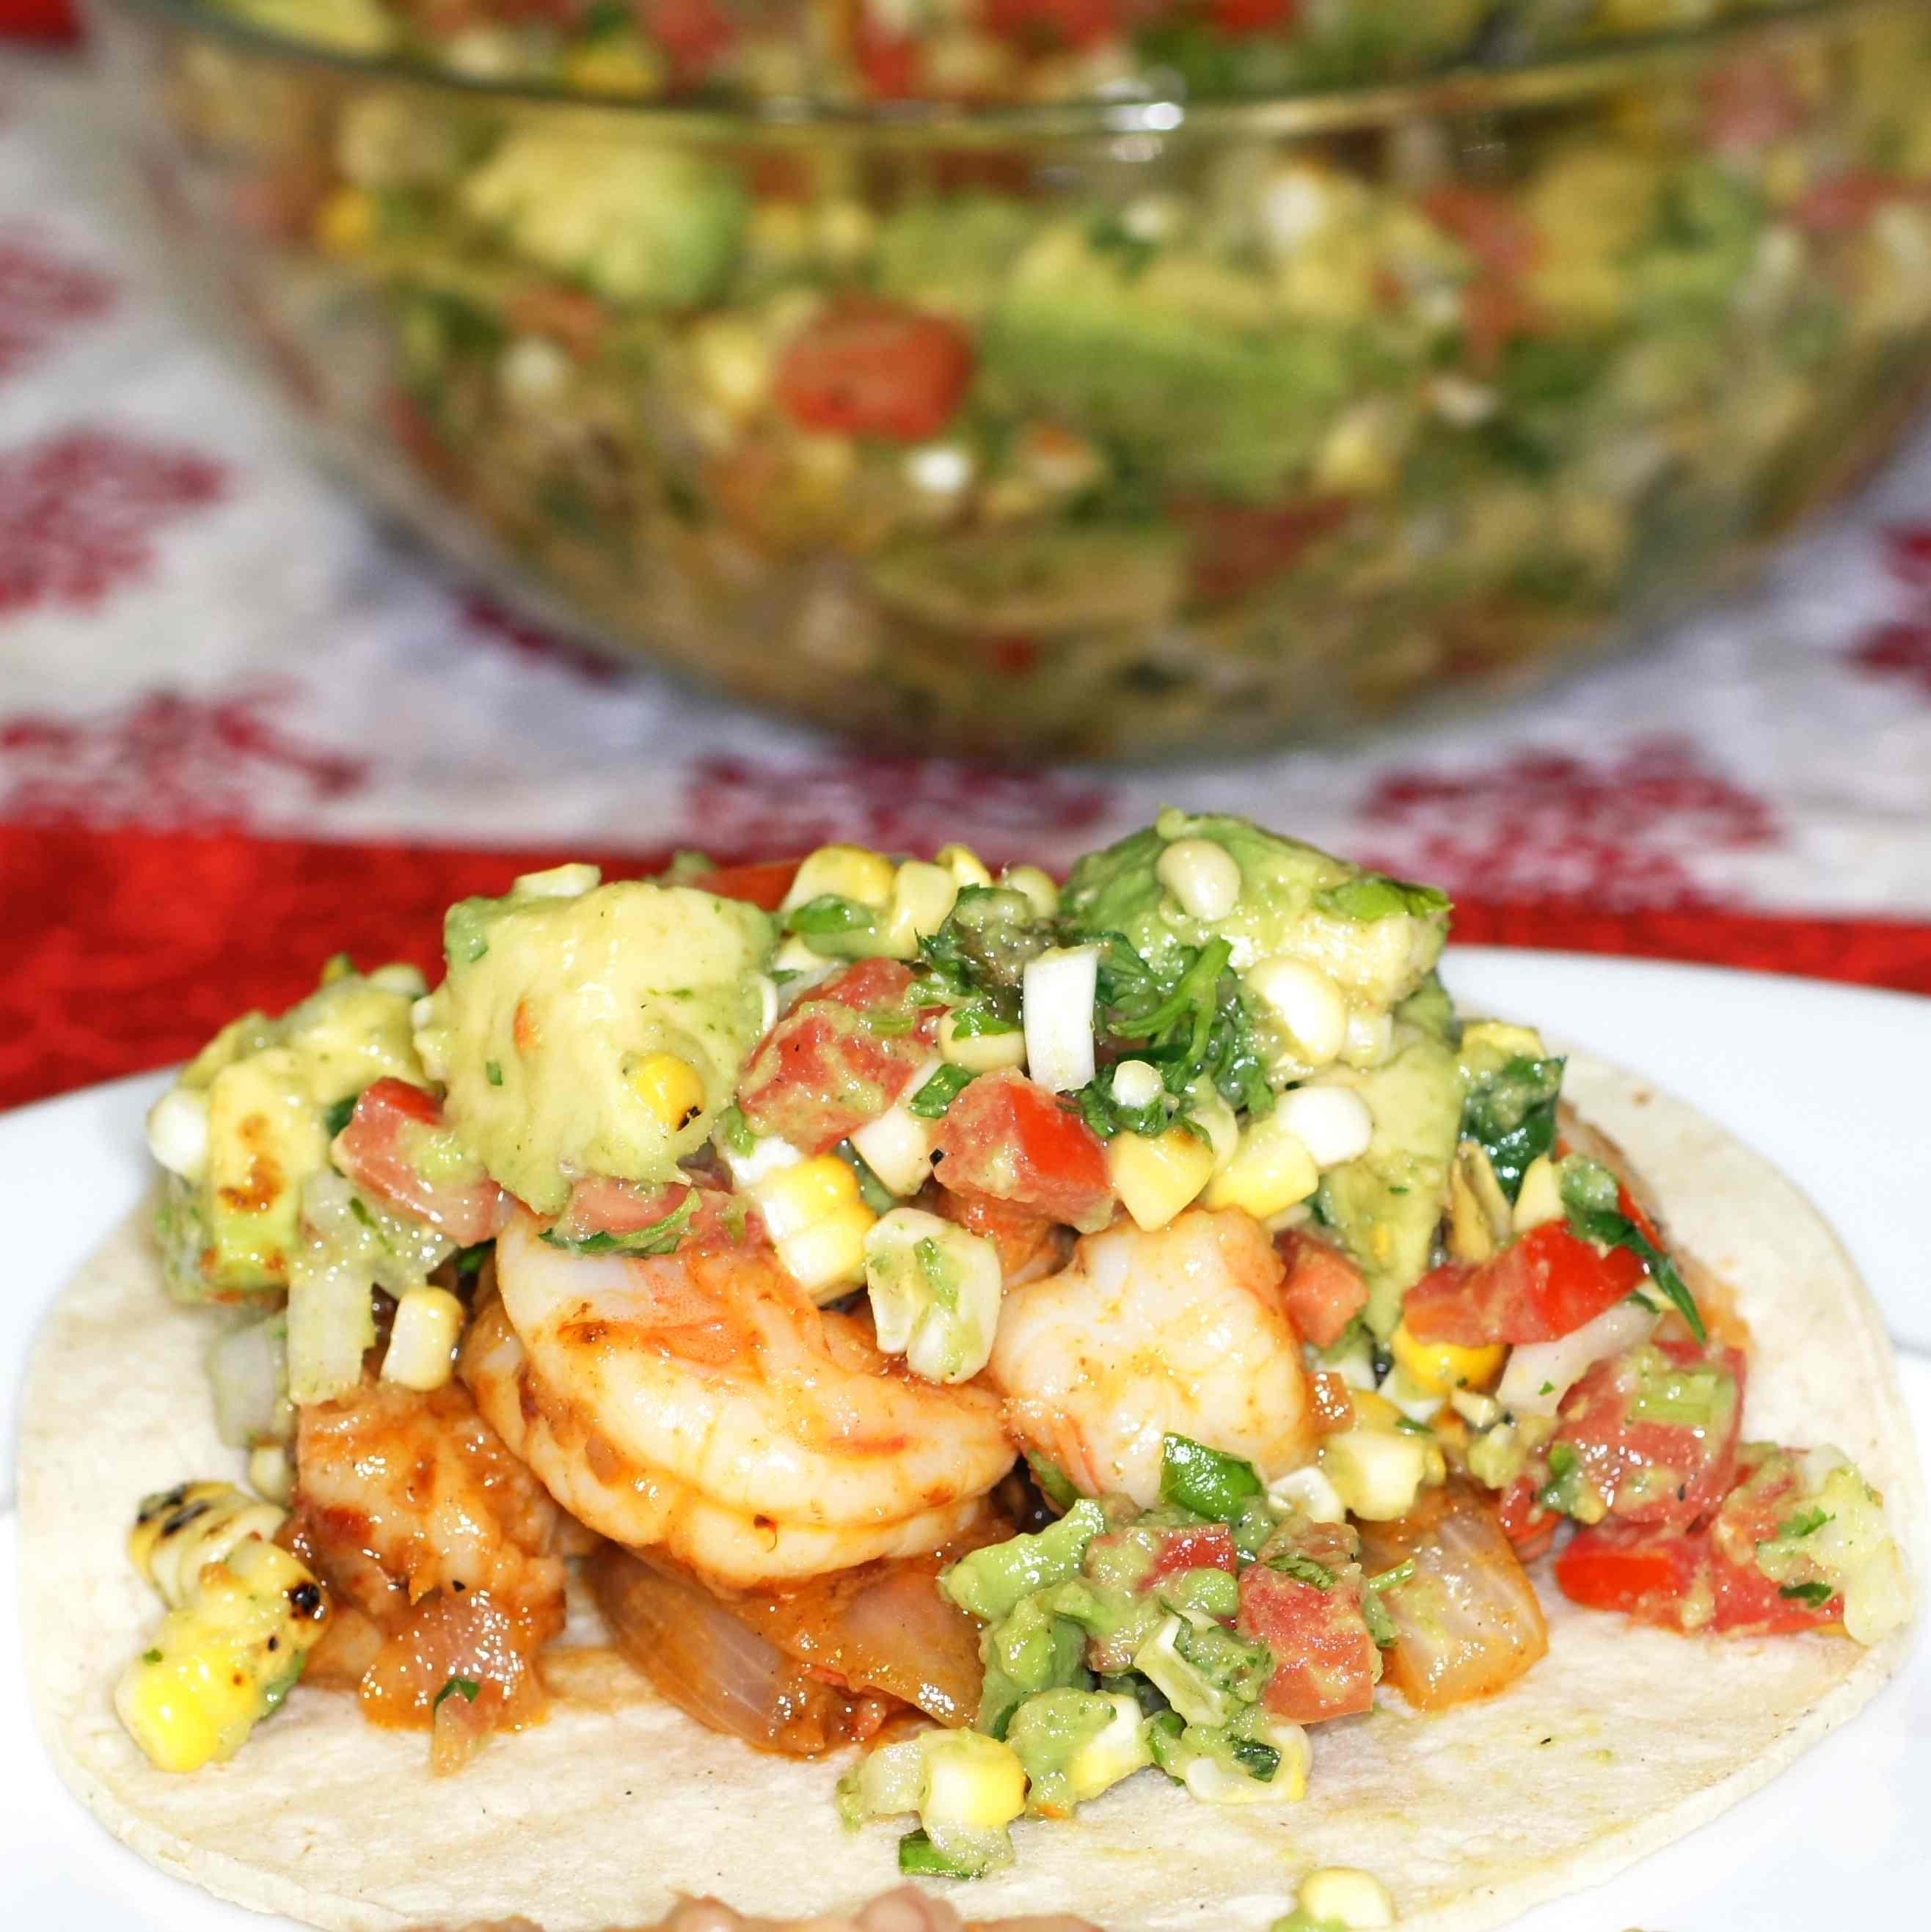 Camarones En Salsa (Shrimp In Salsa) Recipes — Dishmaps